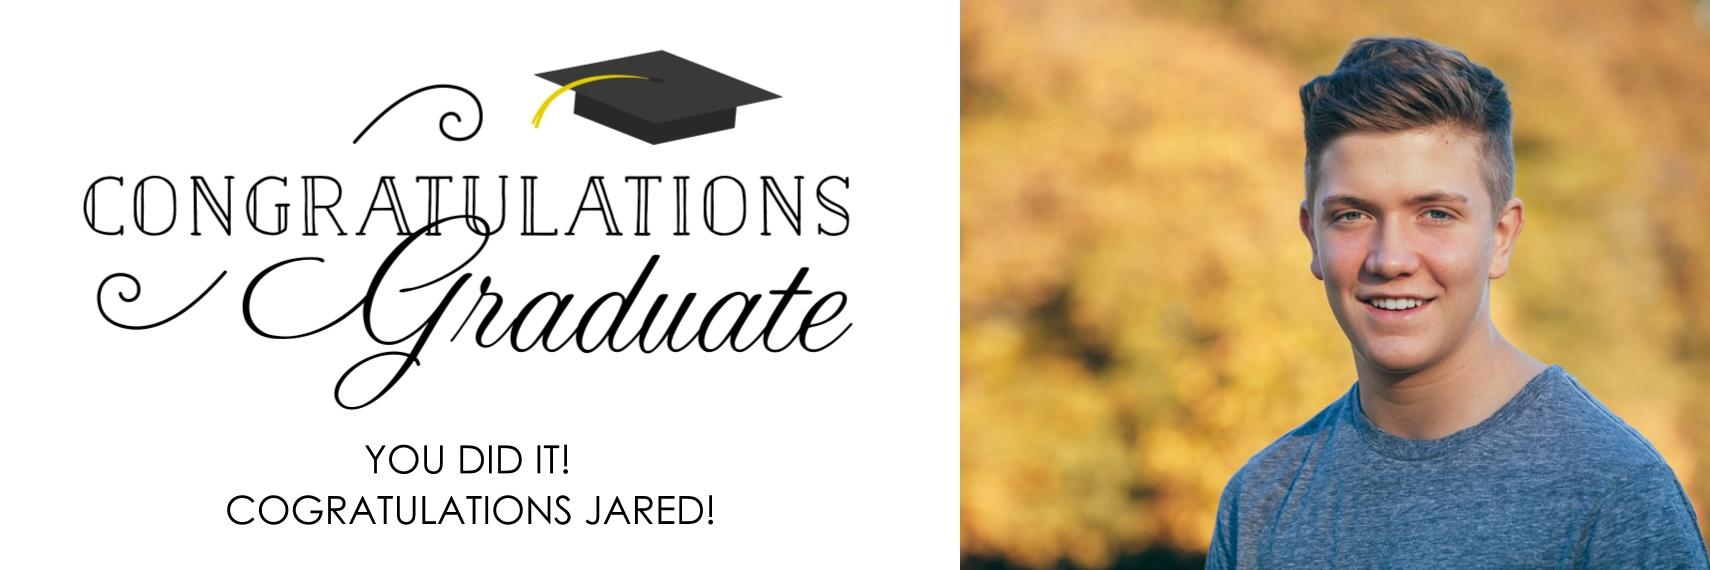 Graduation 1x3 Adhesive Banner, Home Décor -Classic Graduate